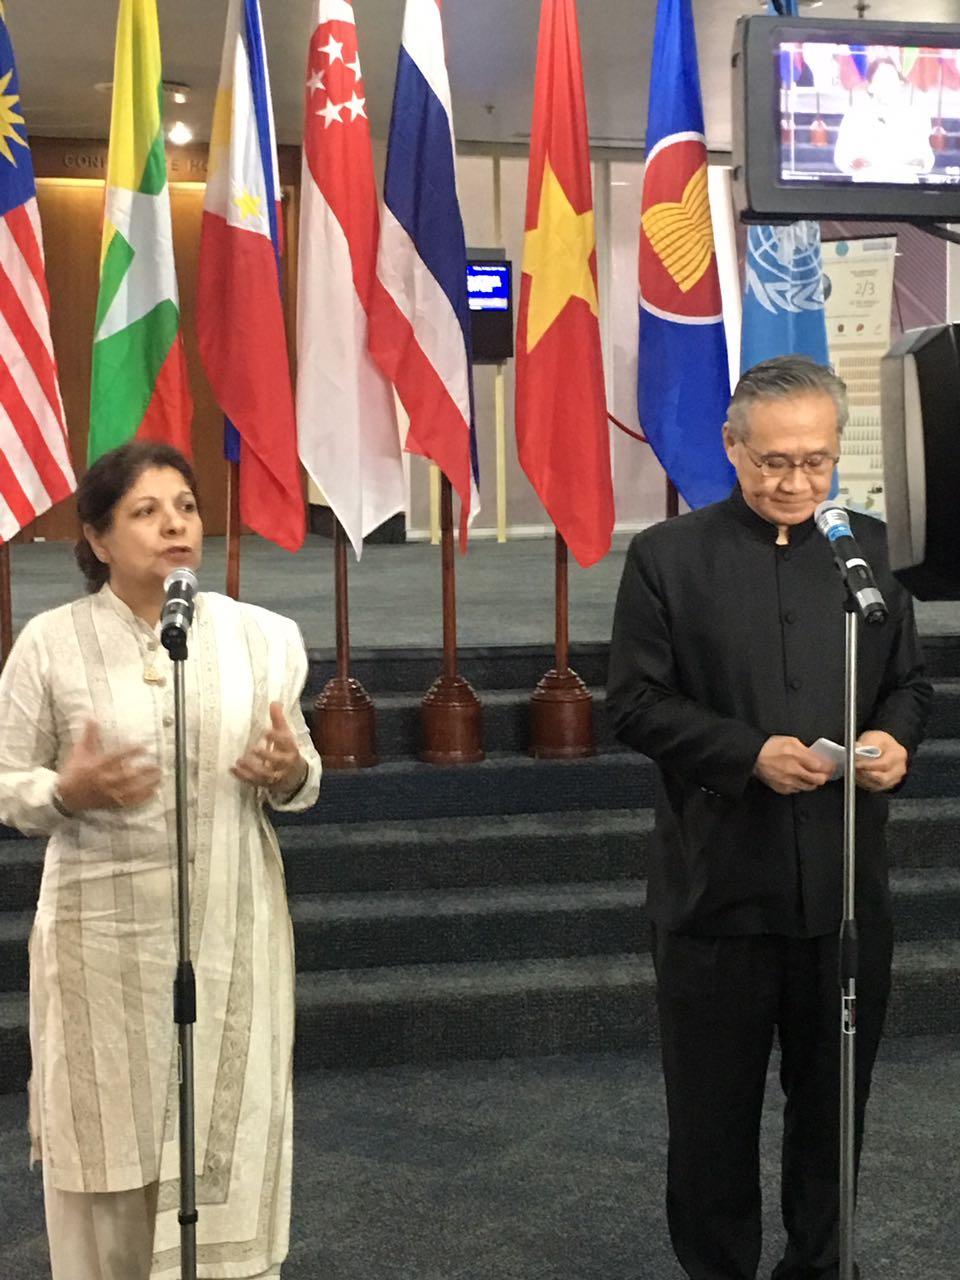 Thai Foreign Minister H.E. Don Pramudwinai and ESCAP ES Dr.Akhtar briefing the media on ASEAN-UN partnership. #Partners4Region https://t.co/iIk9CeiW8D